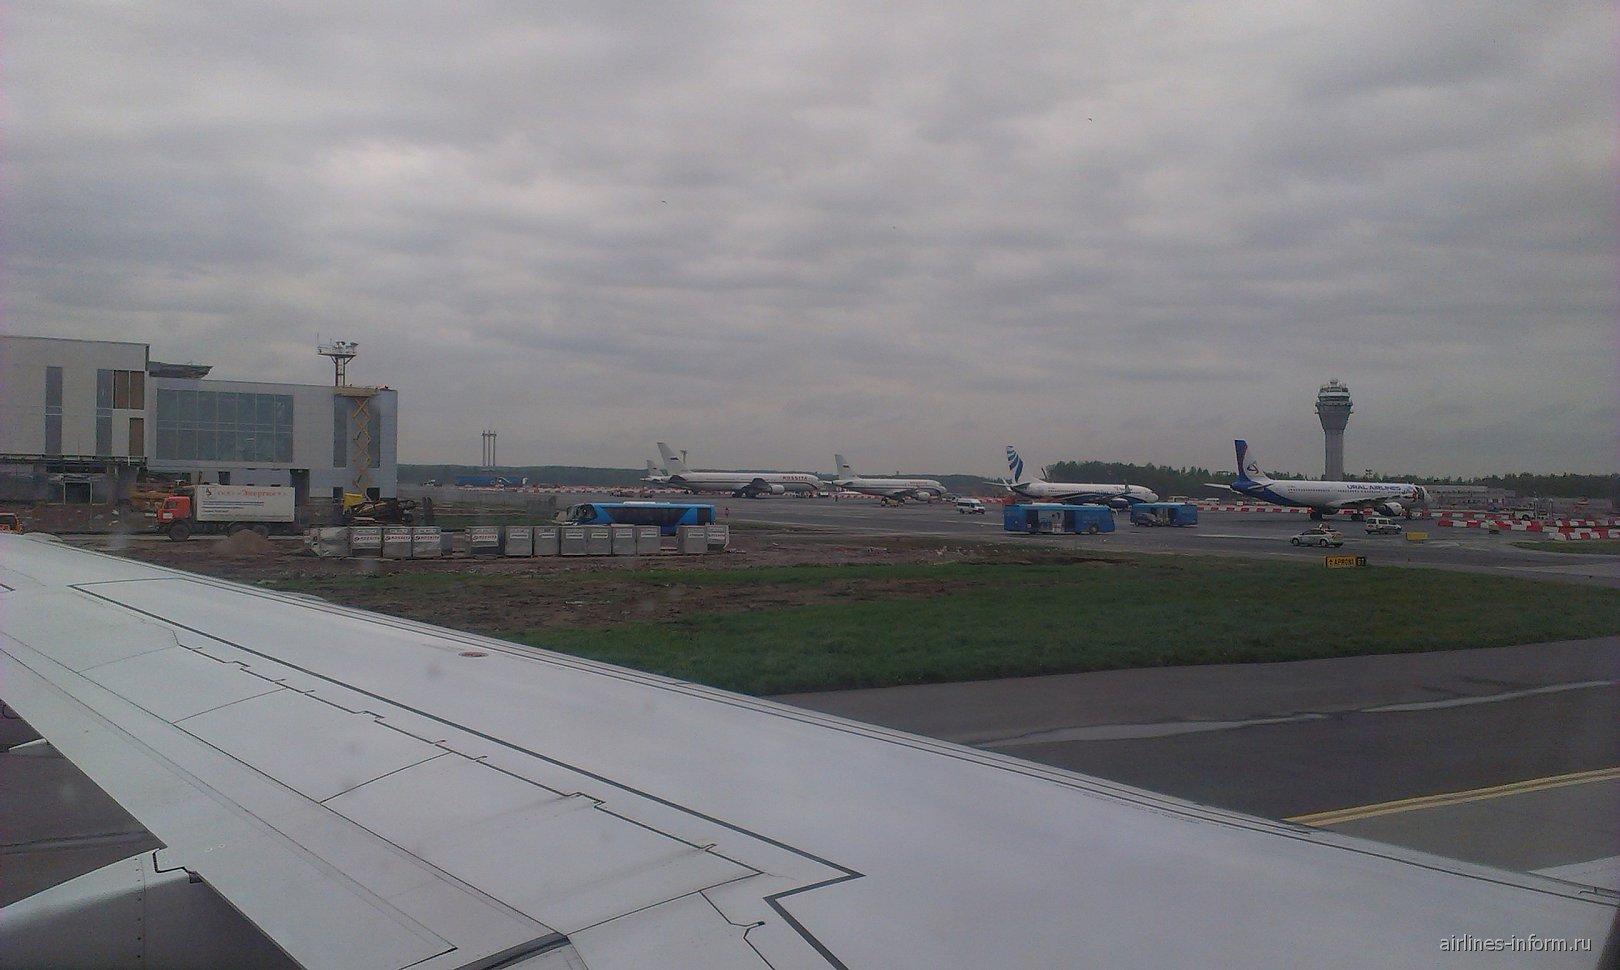 Рейс Минск-Санкт-Петербург авиакомпании Белавиа